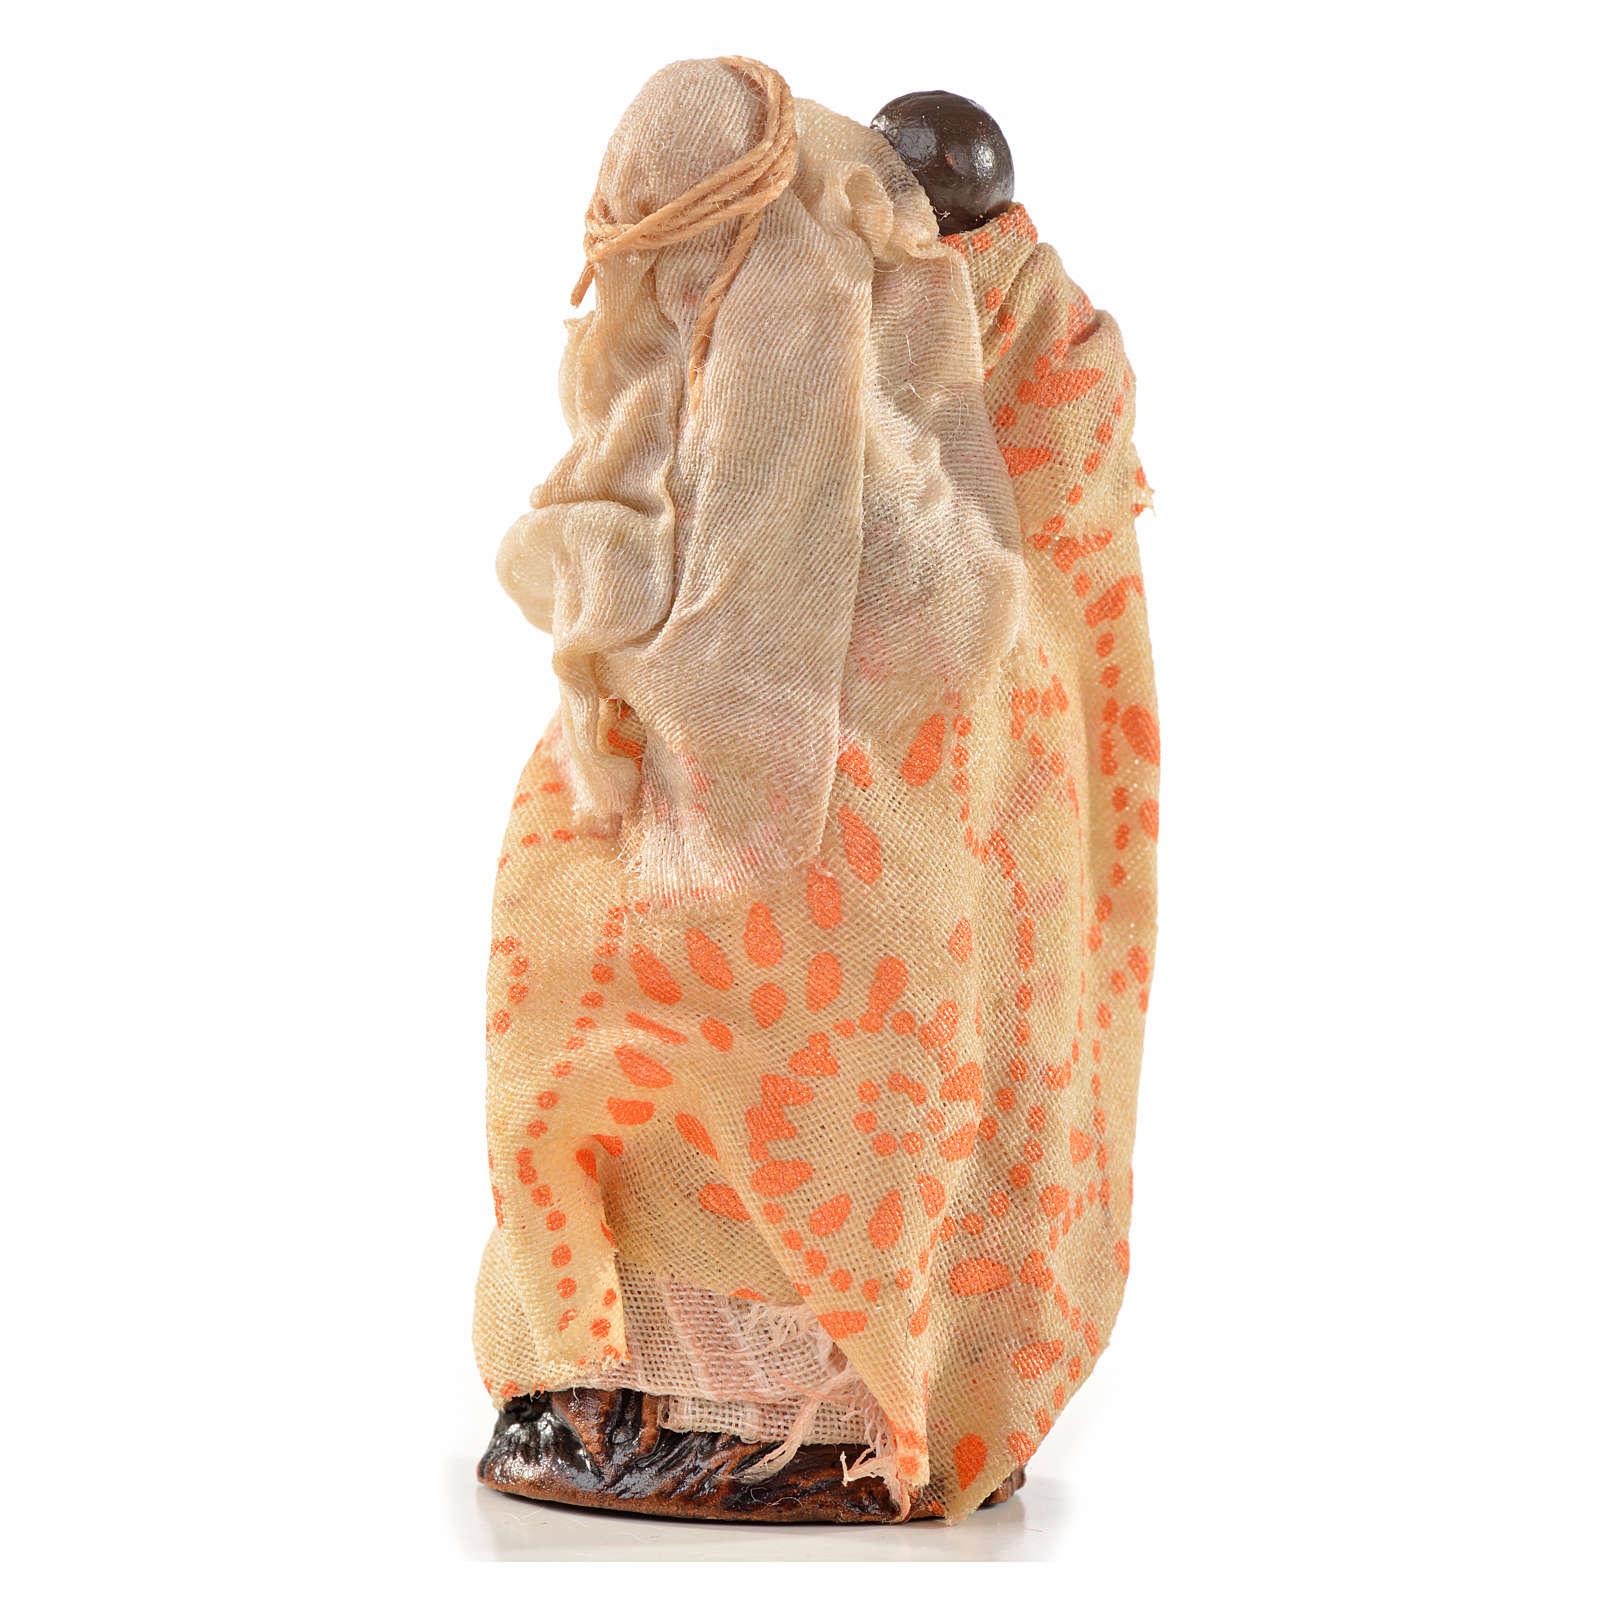 Neapolitan Nativity, Arabian style, woman holding baby 6cm 4